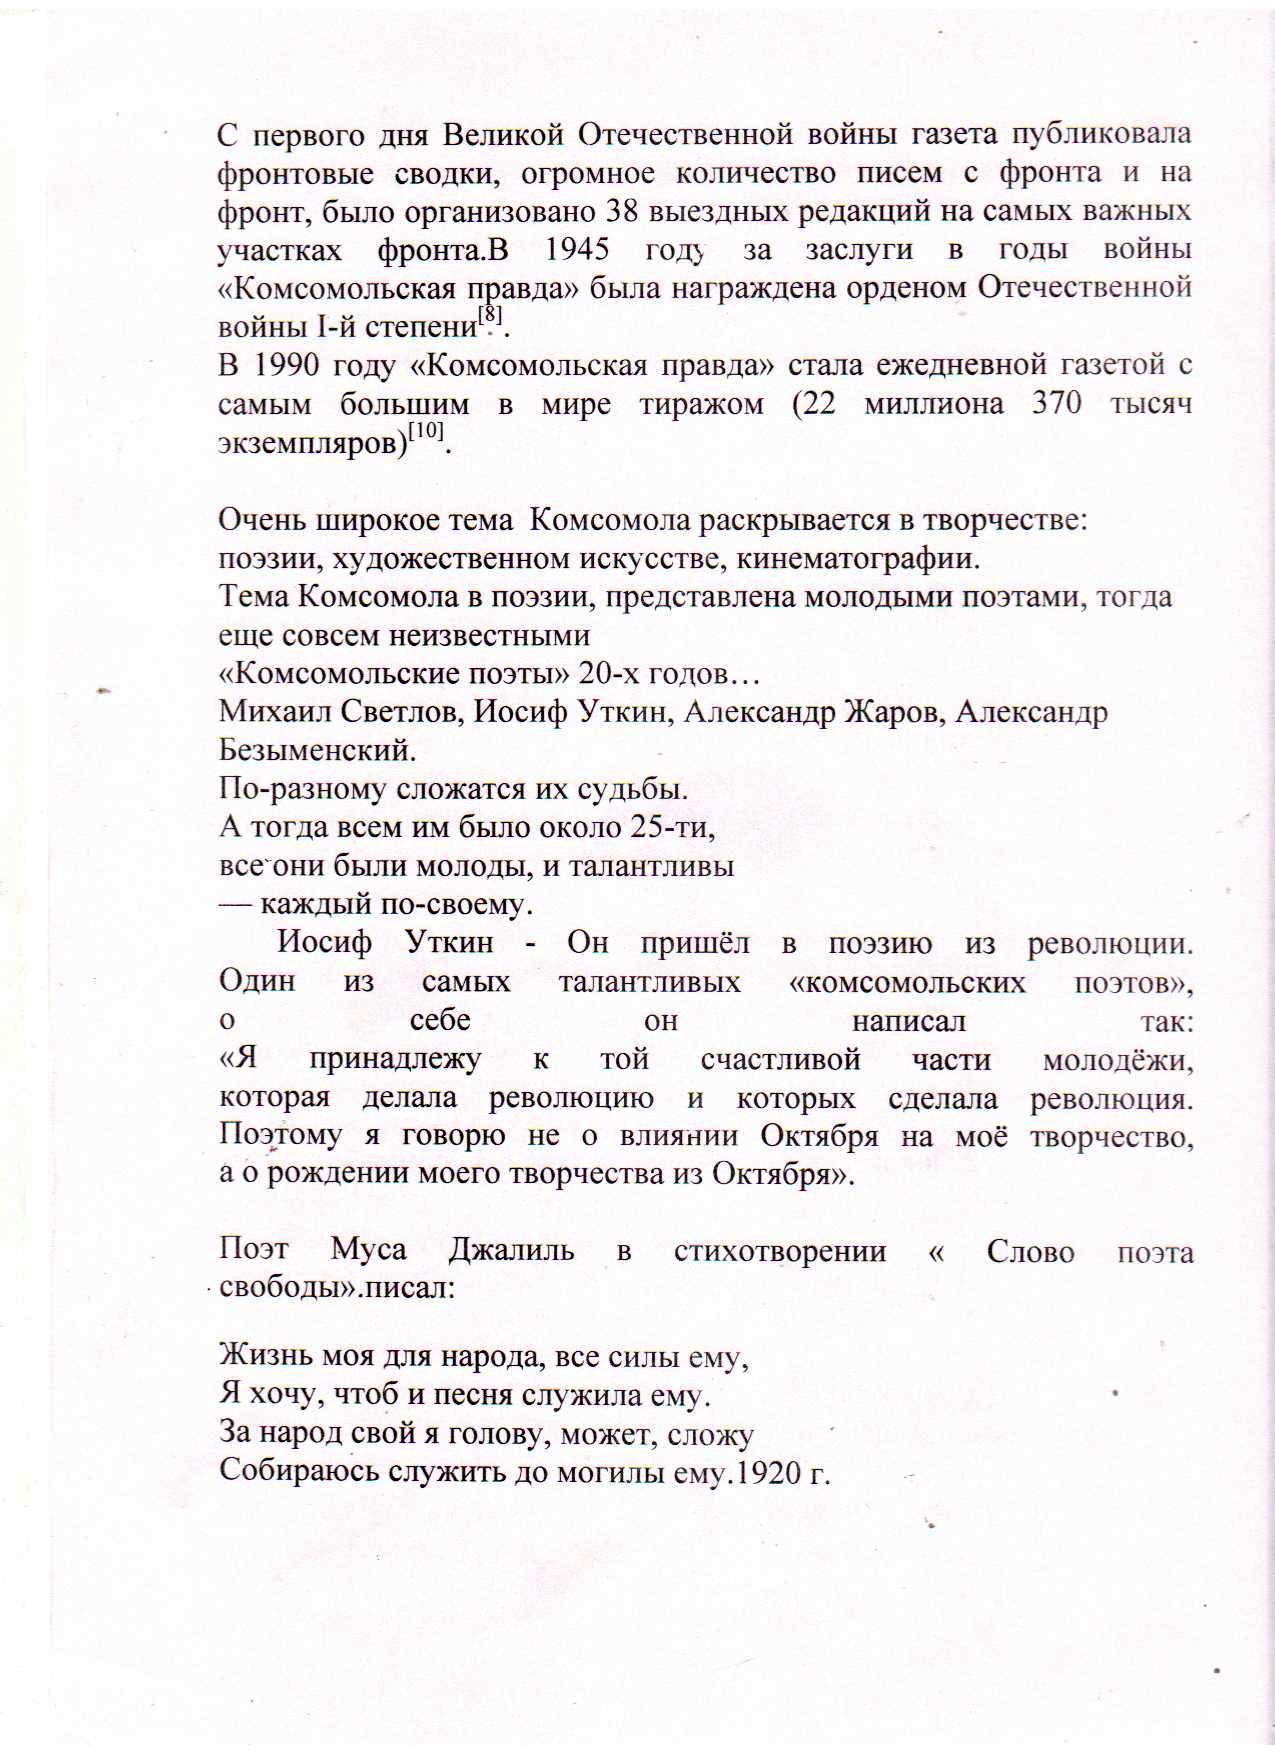 C:\Users\Юля\Desktop\комсомол и казаки 22\4.jpg